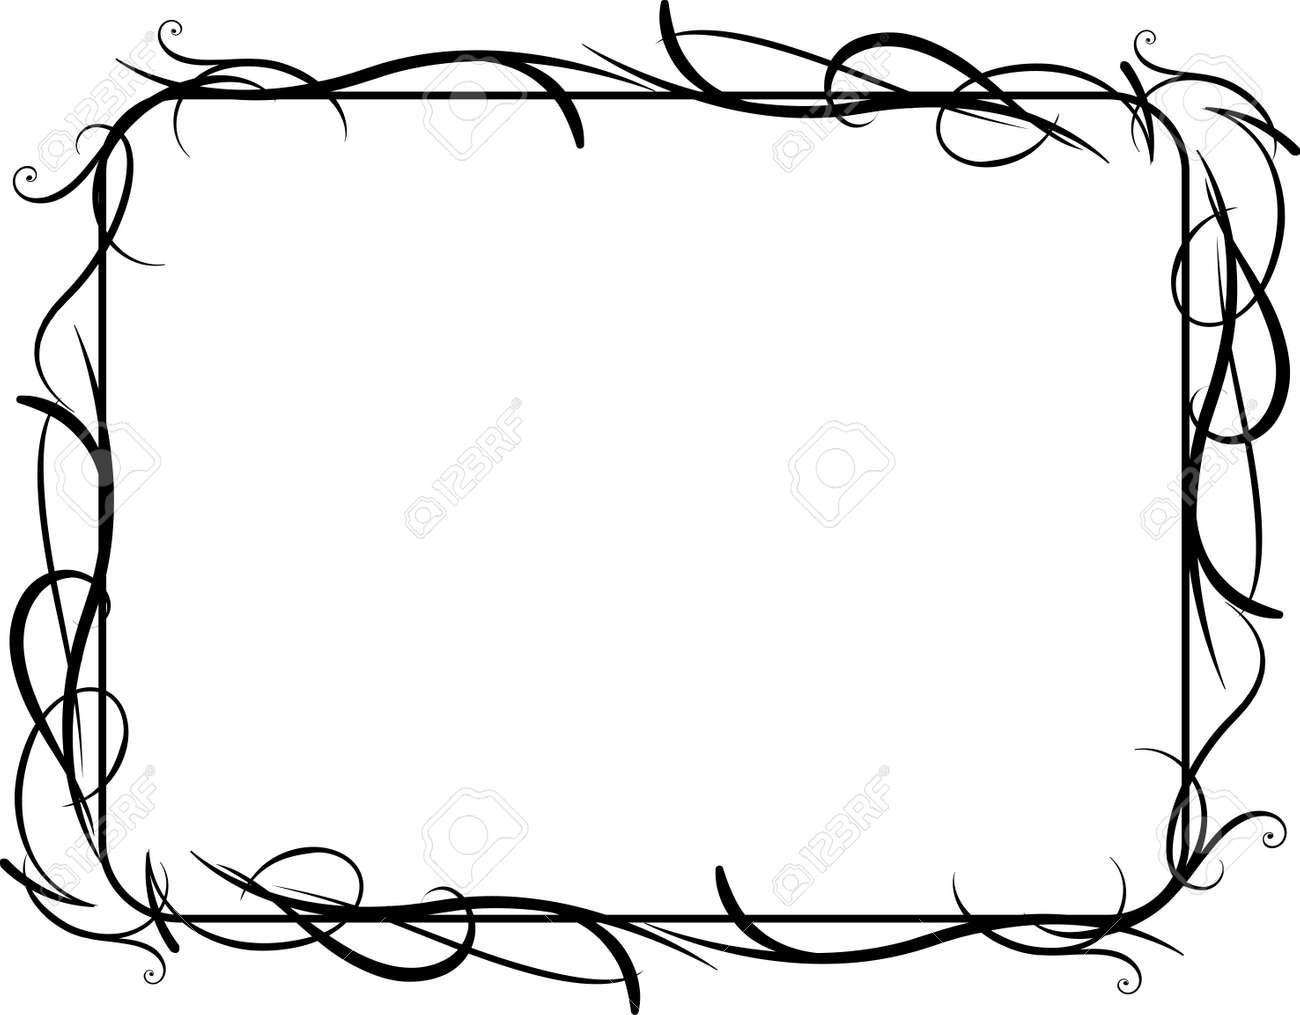 Vector Illustration Of Horizontal Vines Frame Concept Royalty Free ...